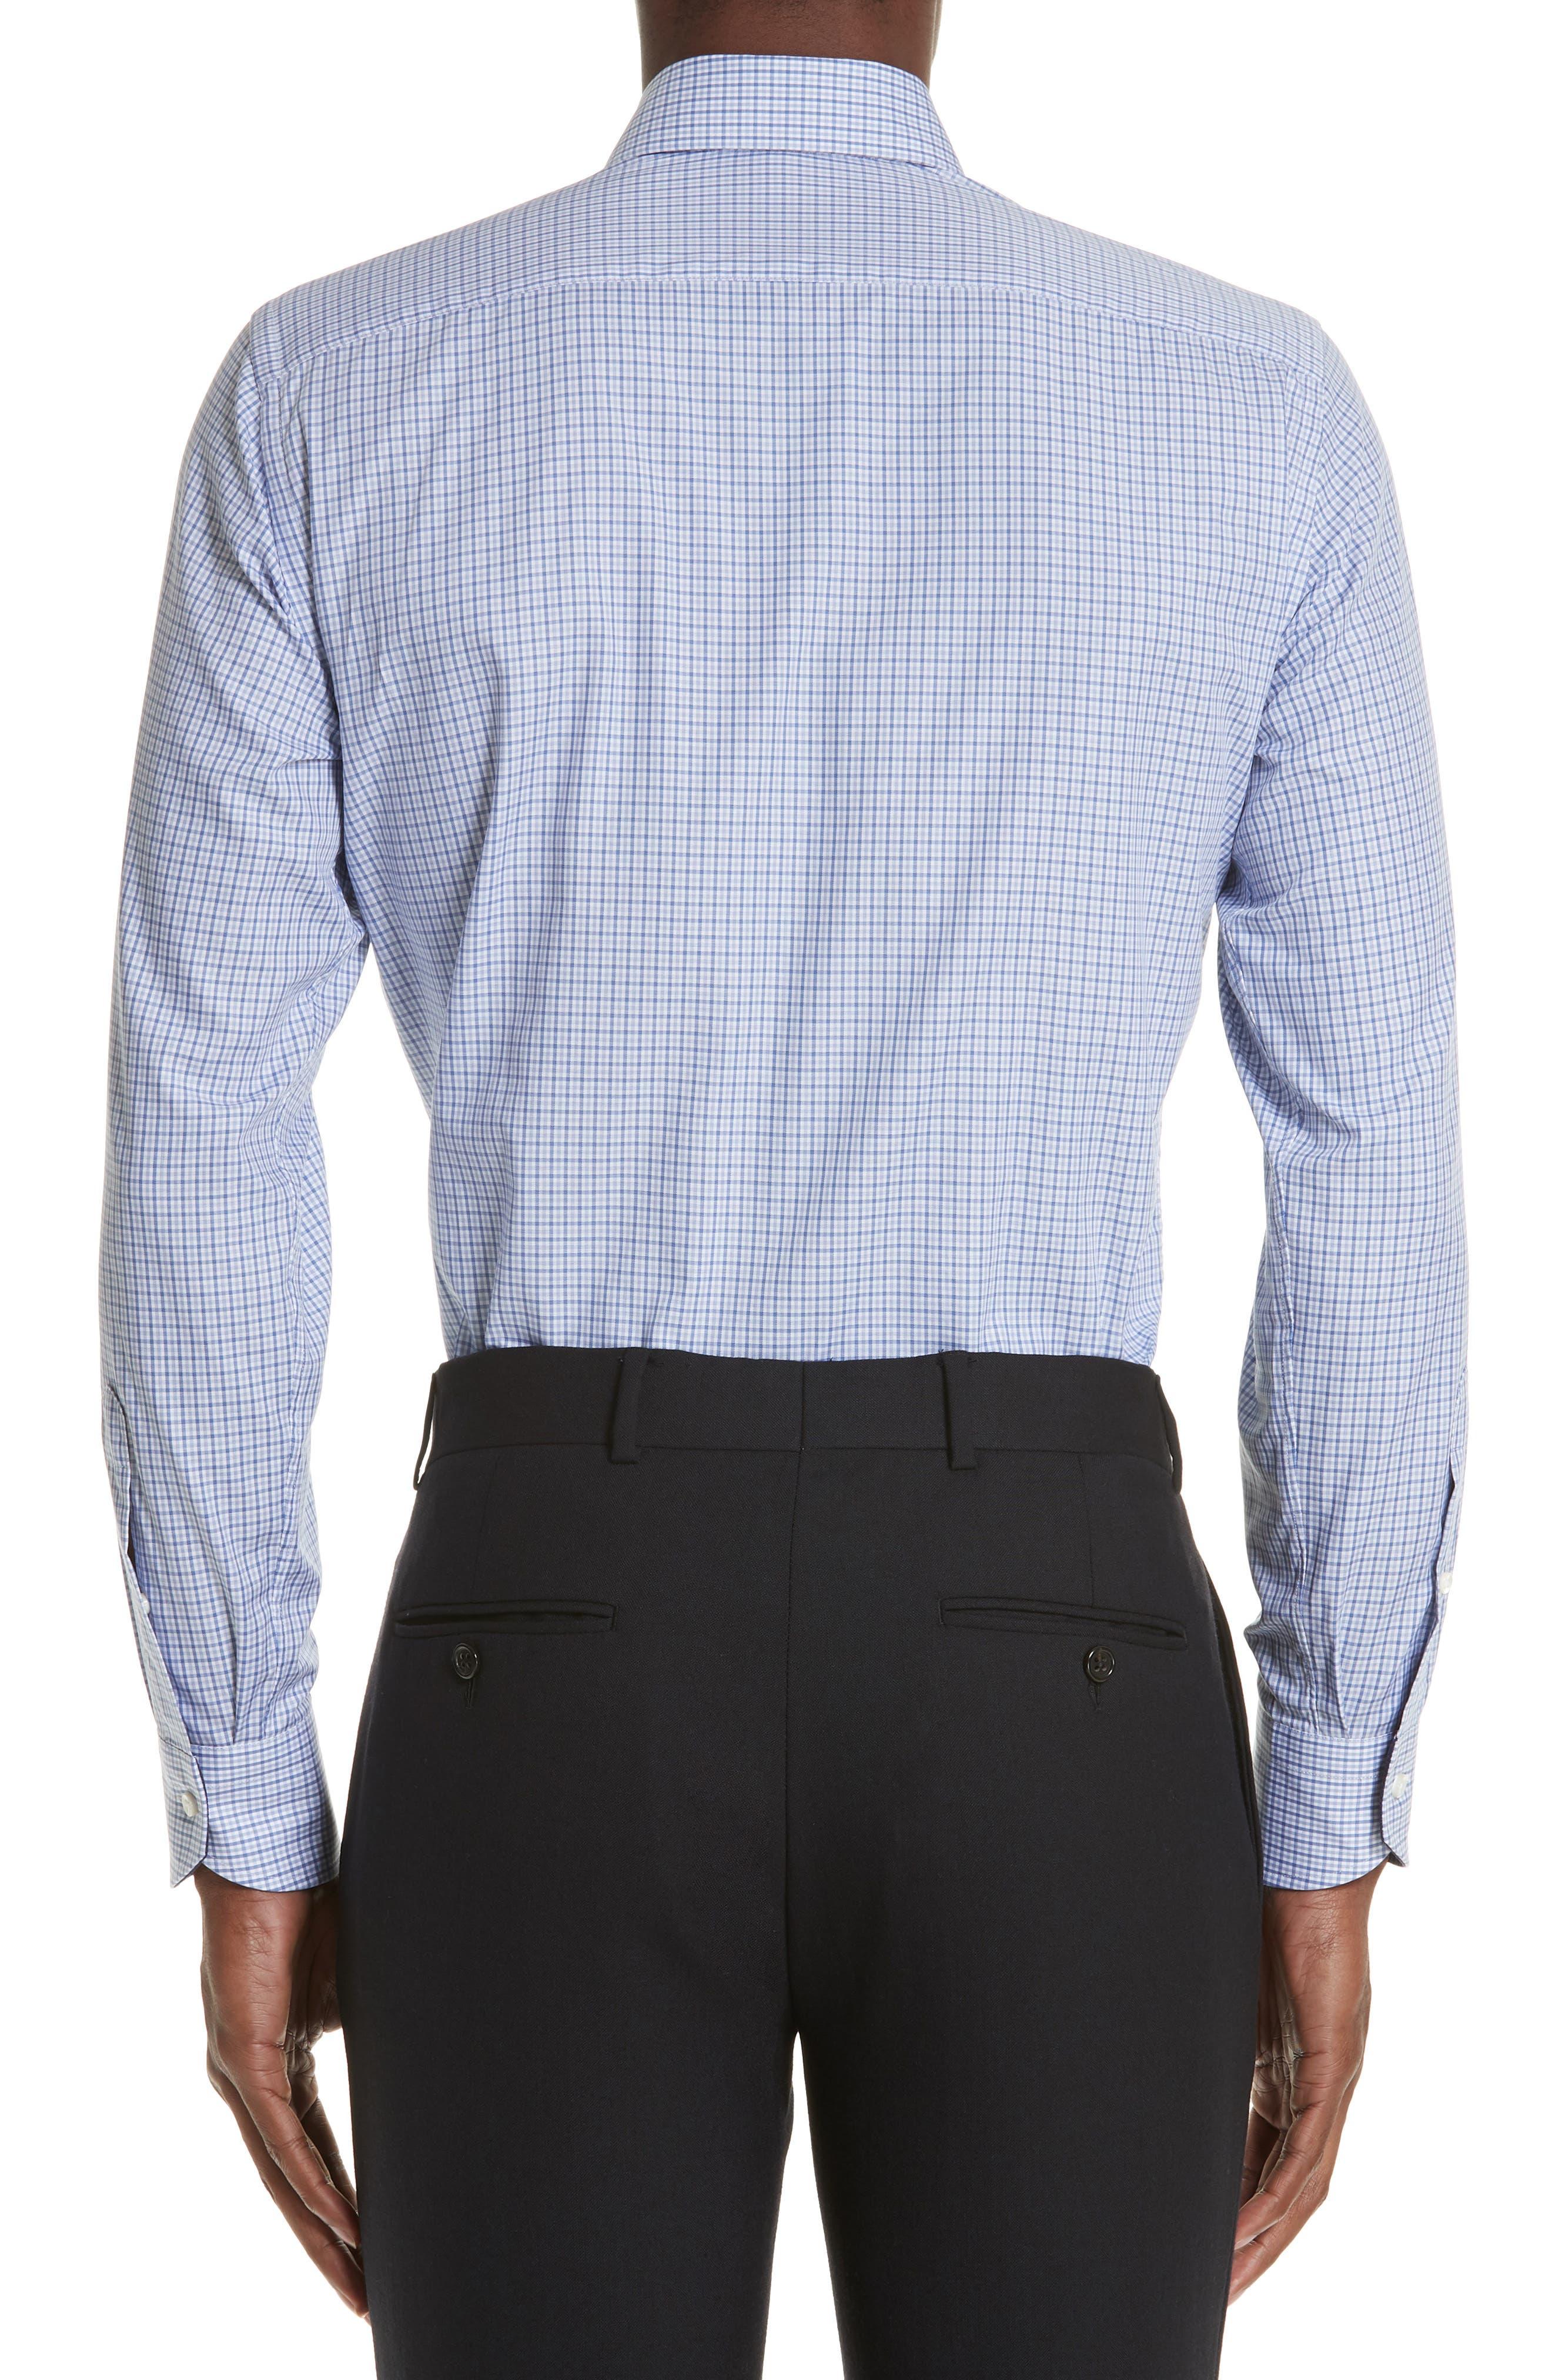 Regular Fit Check Dress Shirt,                             Alternate thumbnail 3, color,                             420